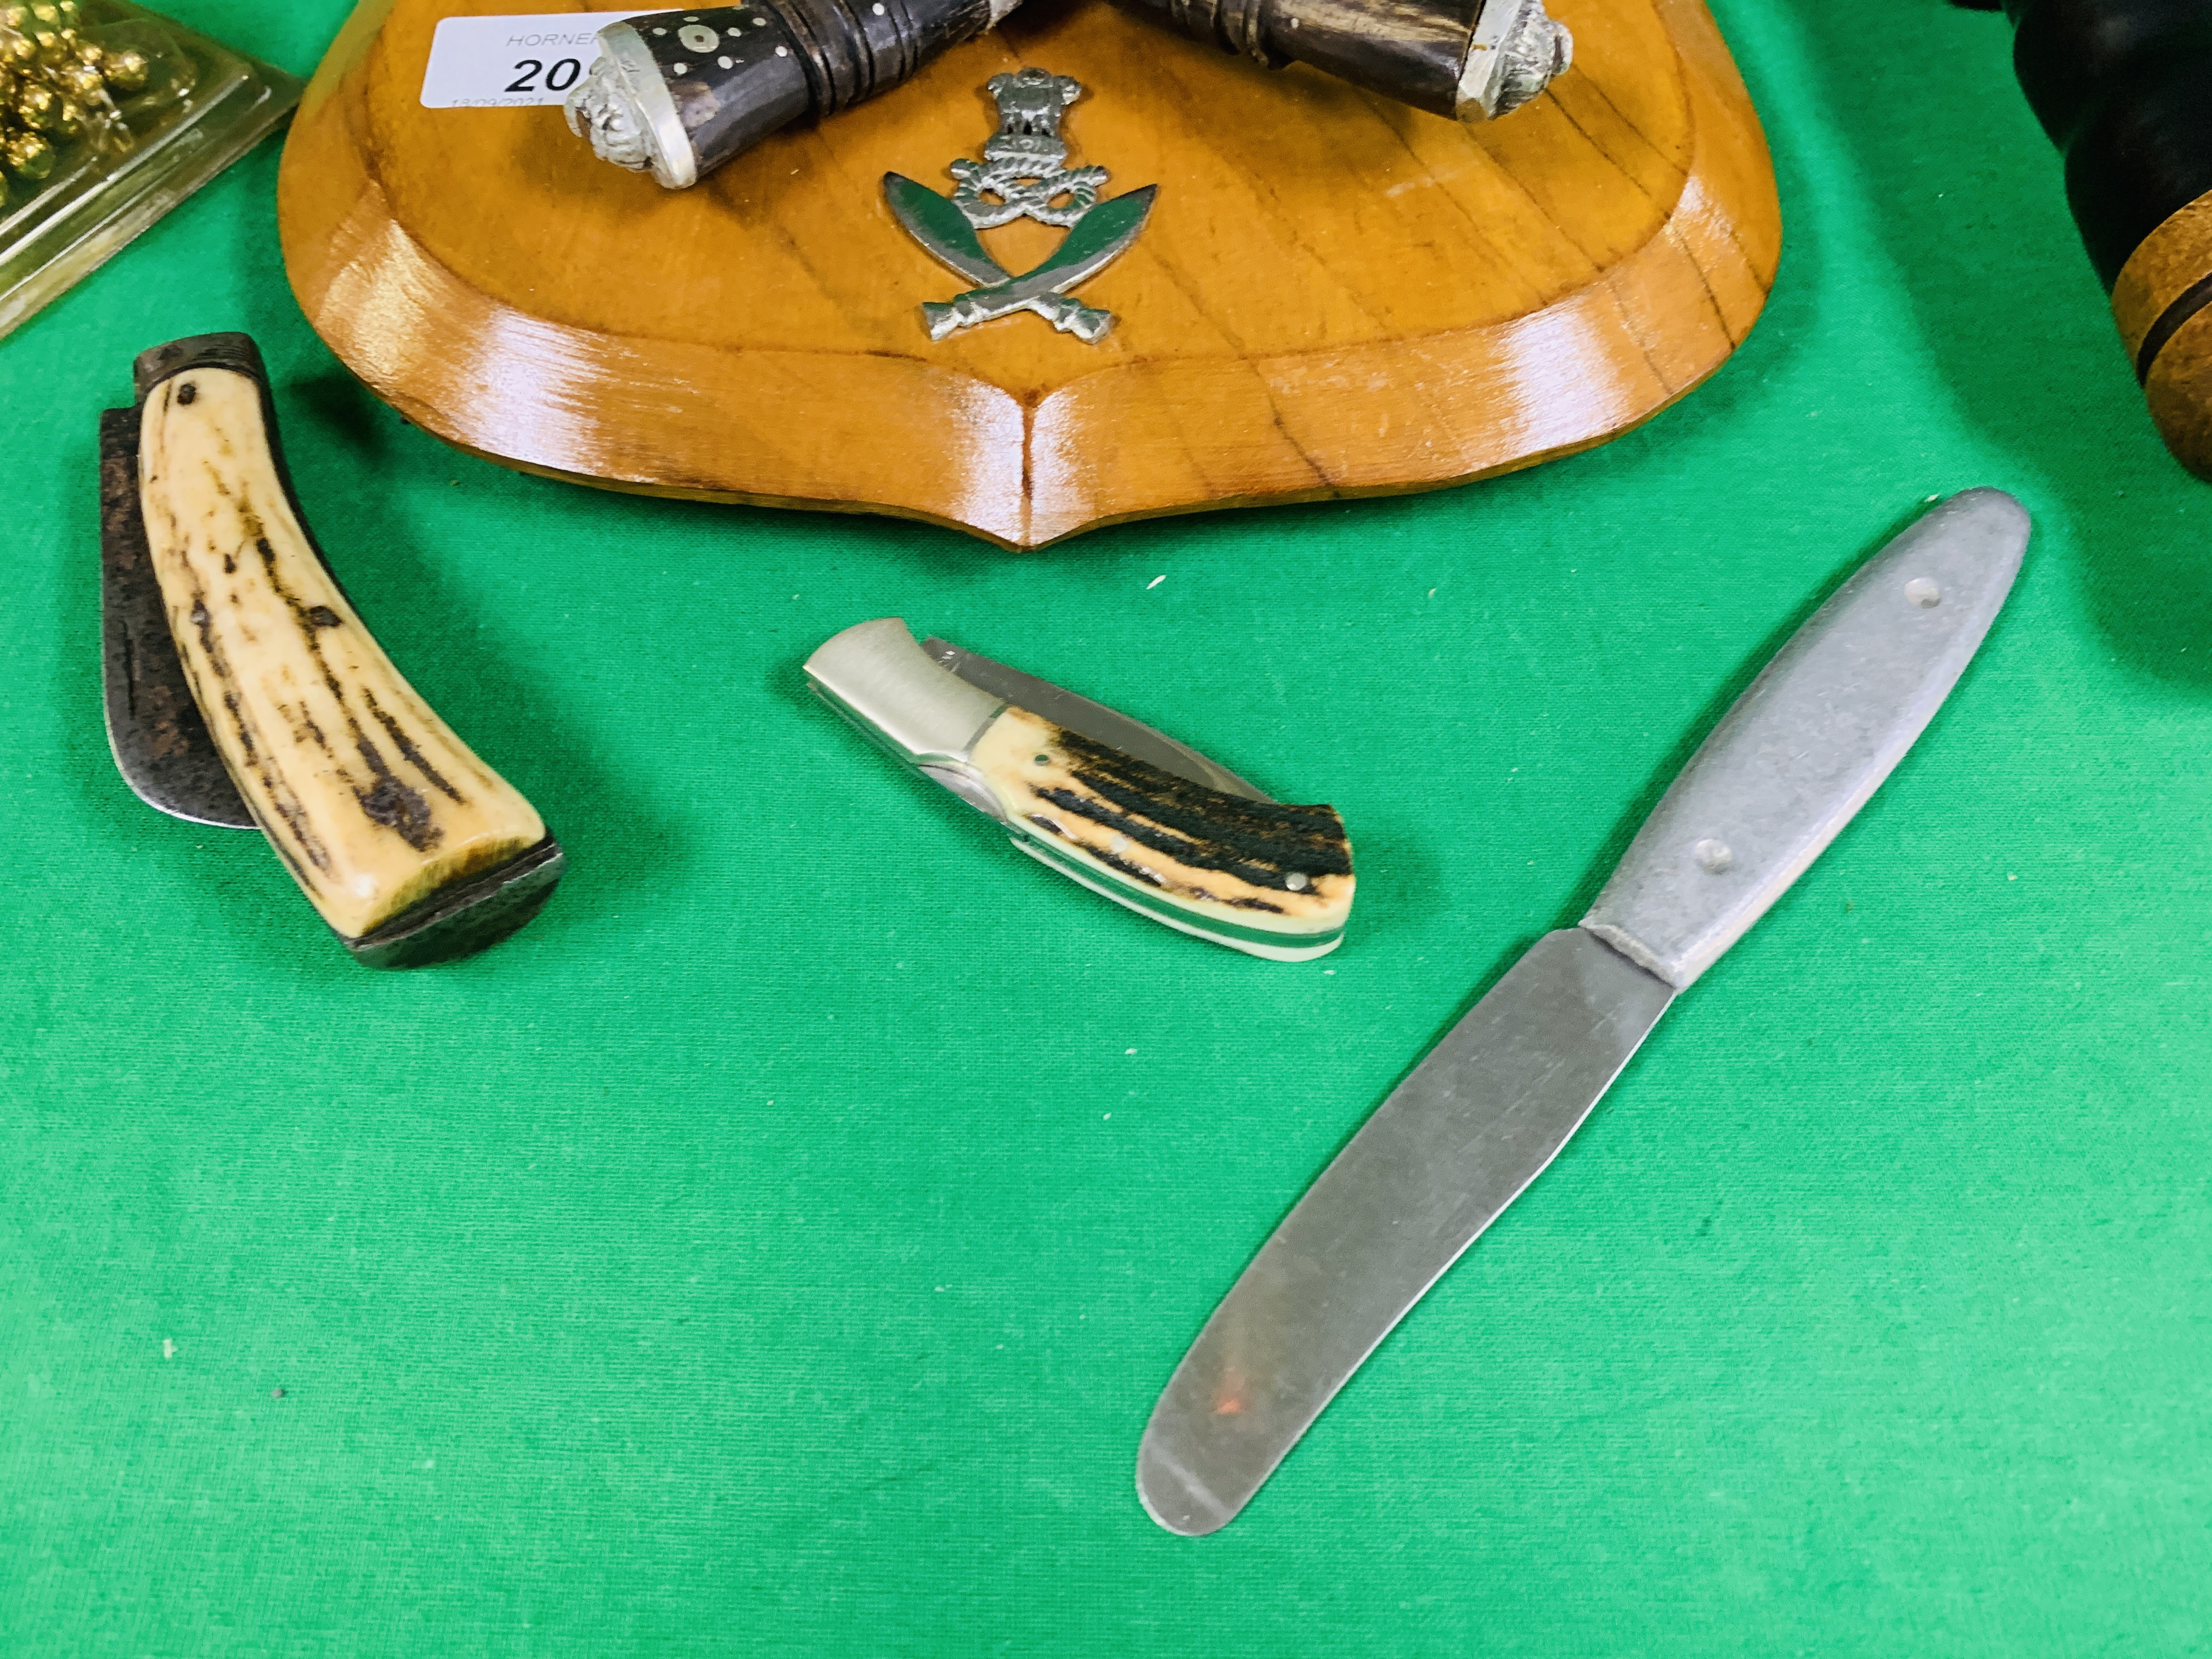 A PAIR OF CARL ZEISS 8 X 30 BINOCULARS, A DUCK CALL, SLINGSHOT & BALL BEARINGS, - Image 5 of 7